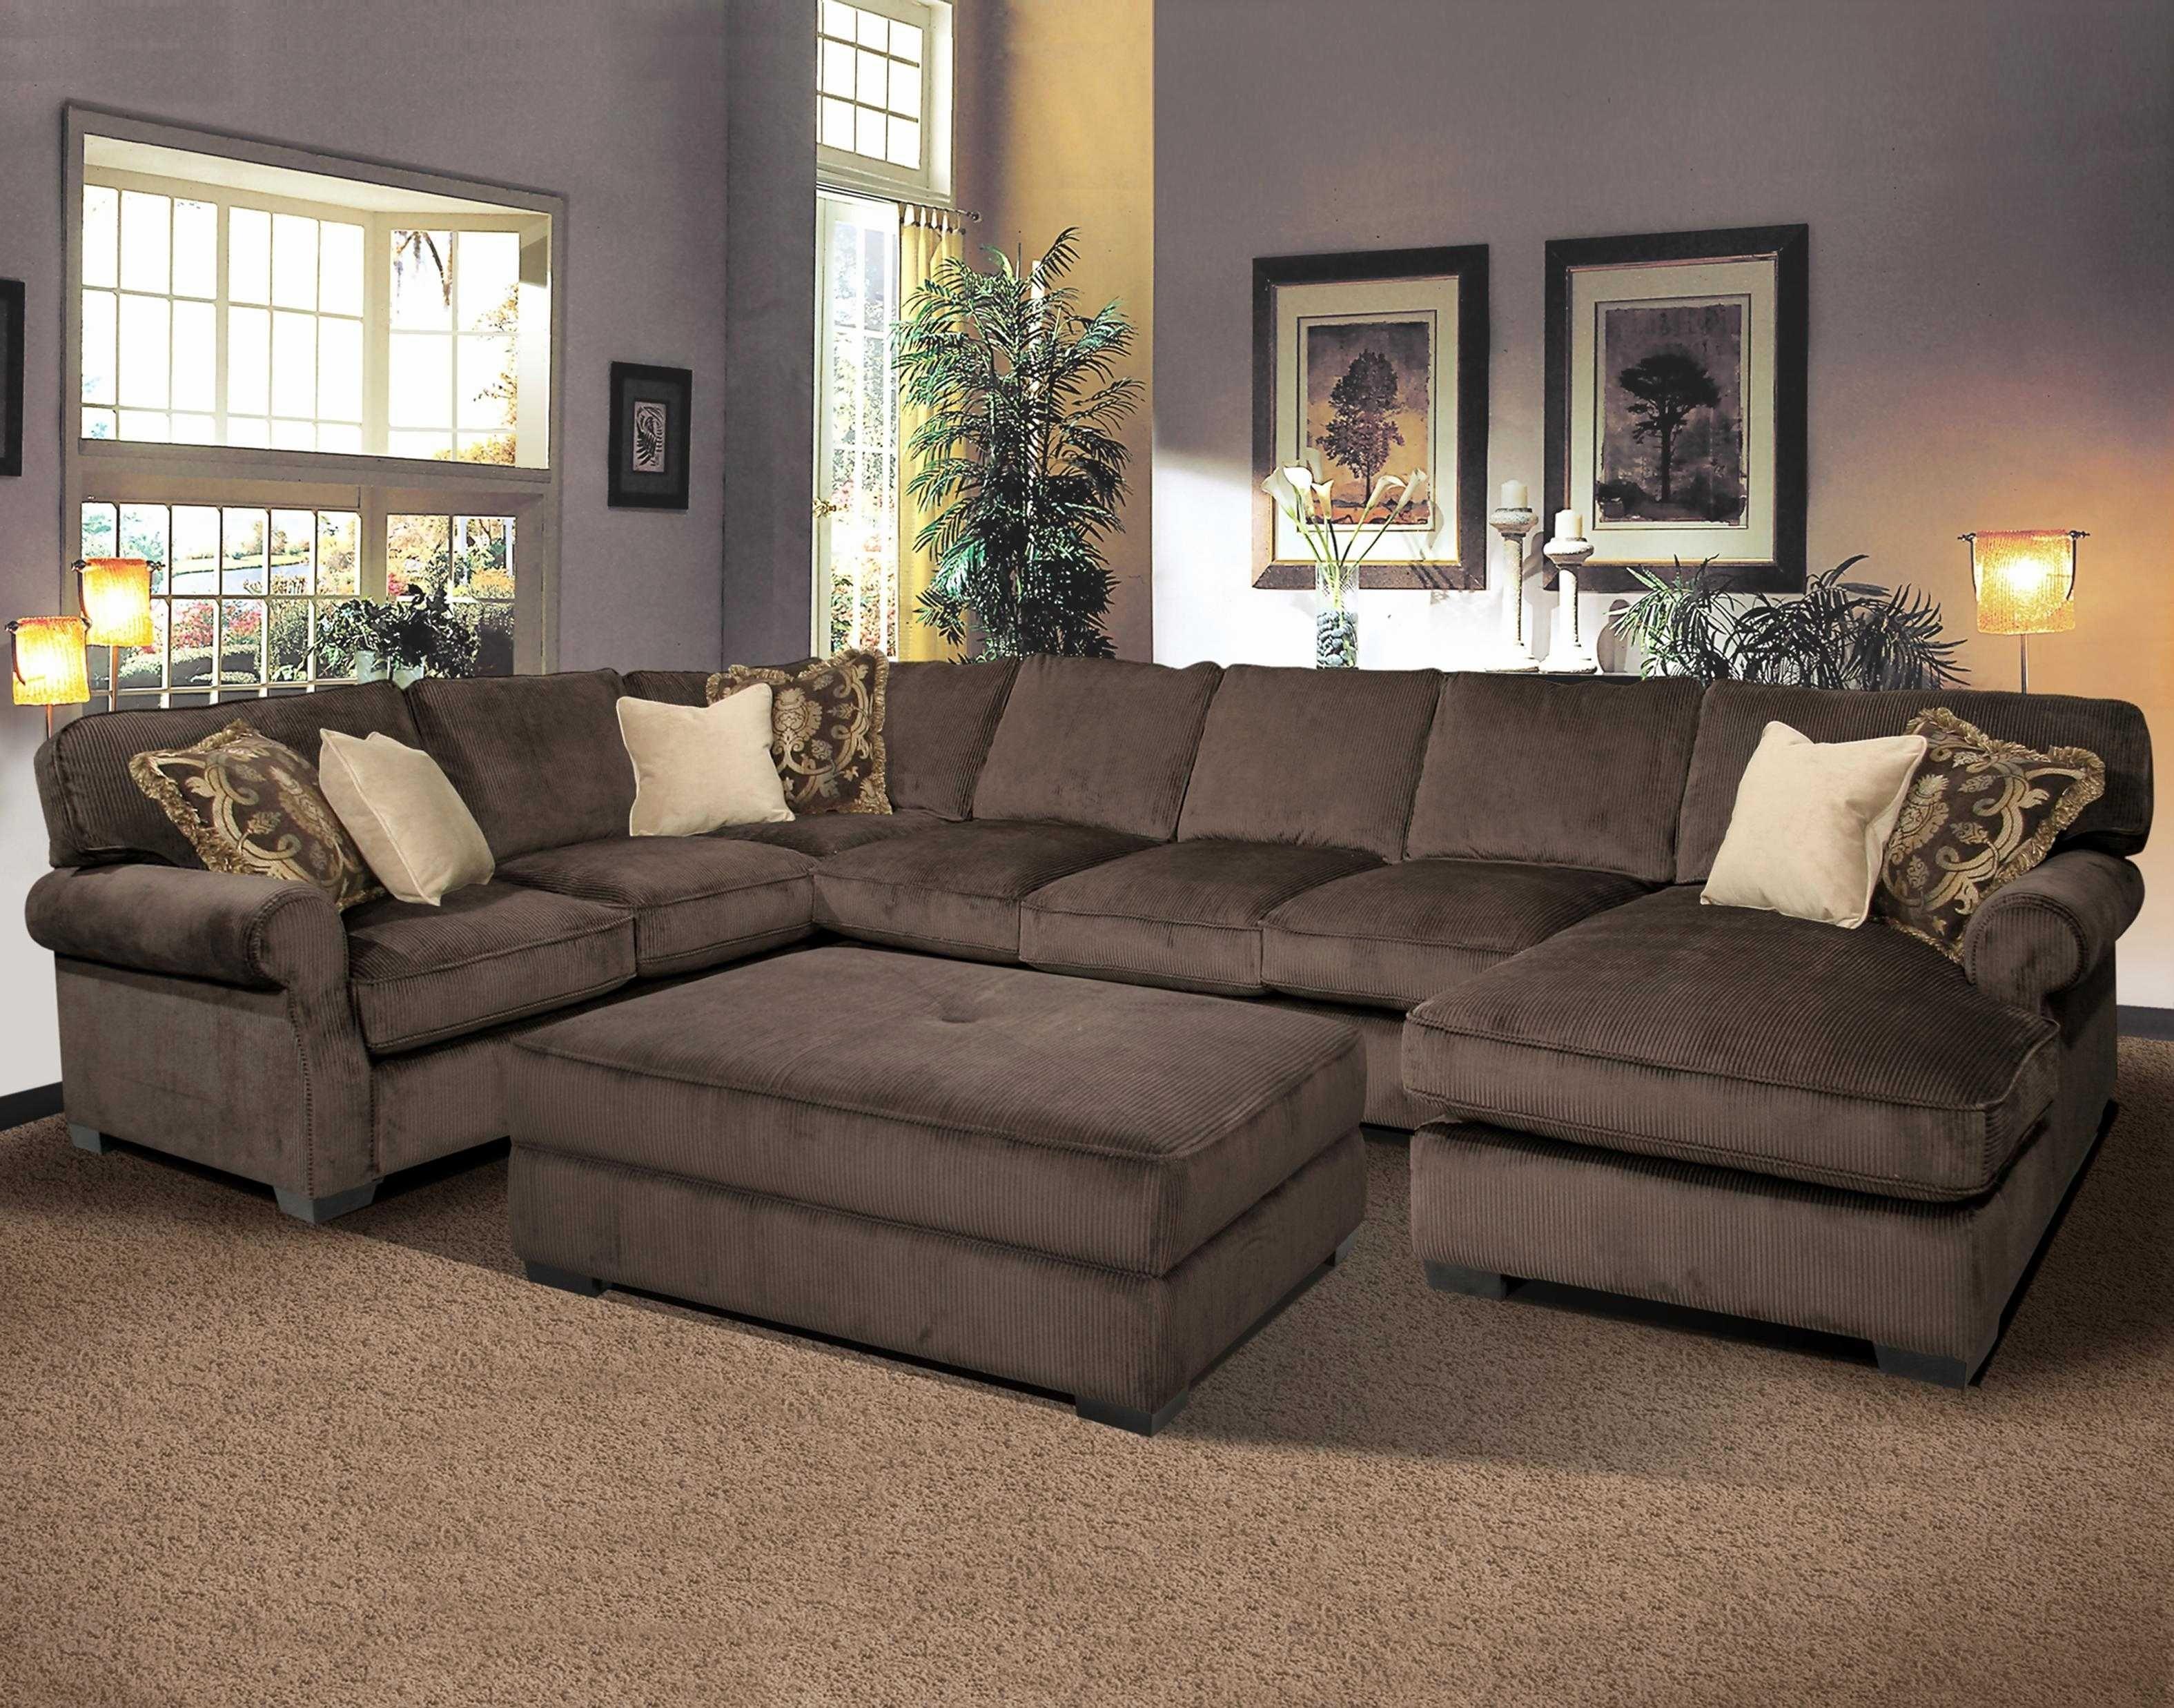 2020 Latest Wide Sectional Sofas Sofa Ideas Home Home